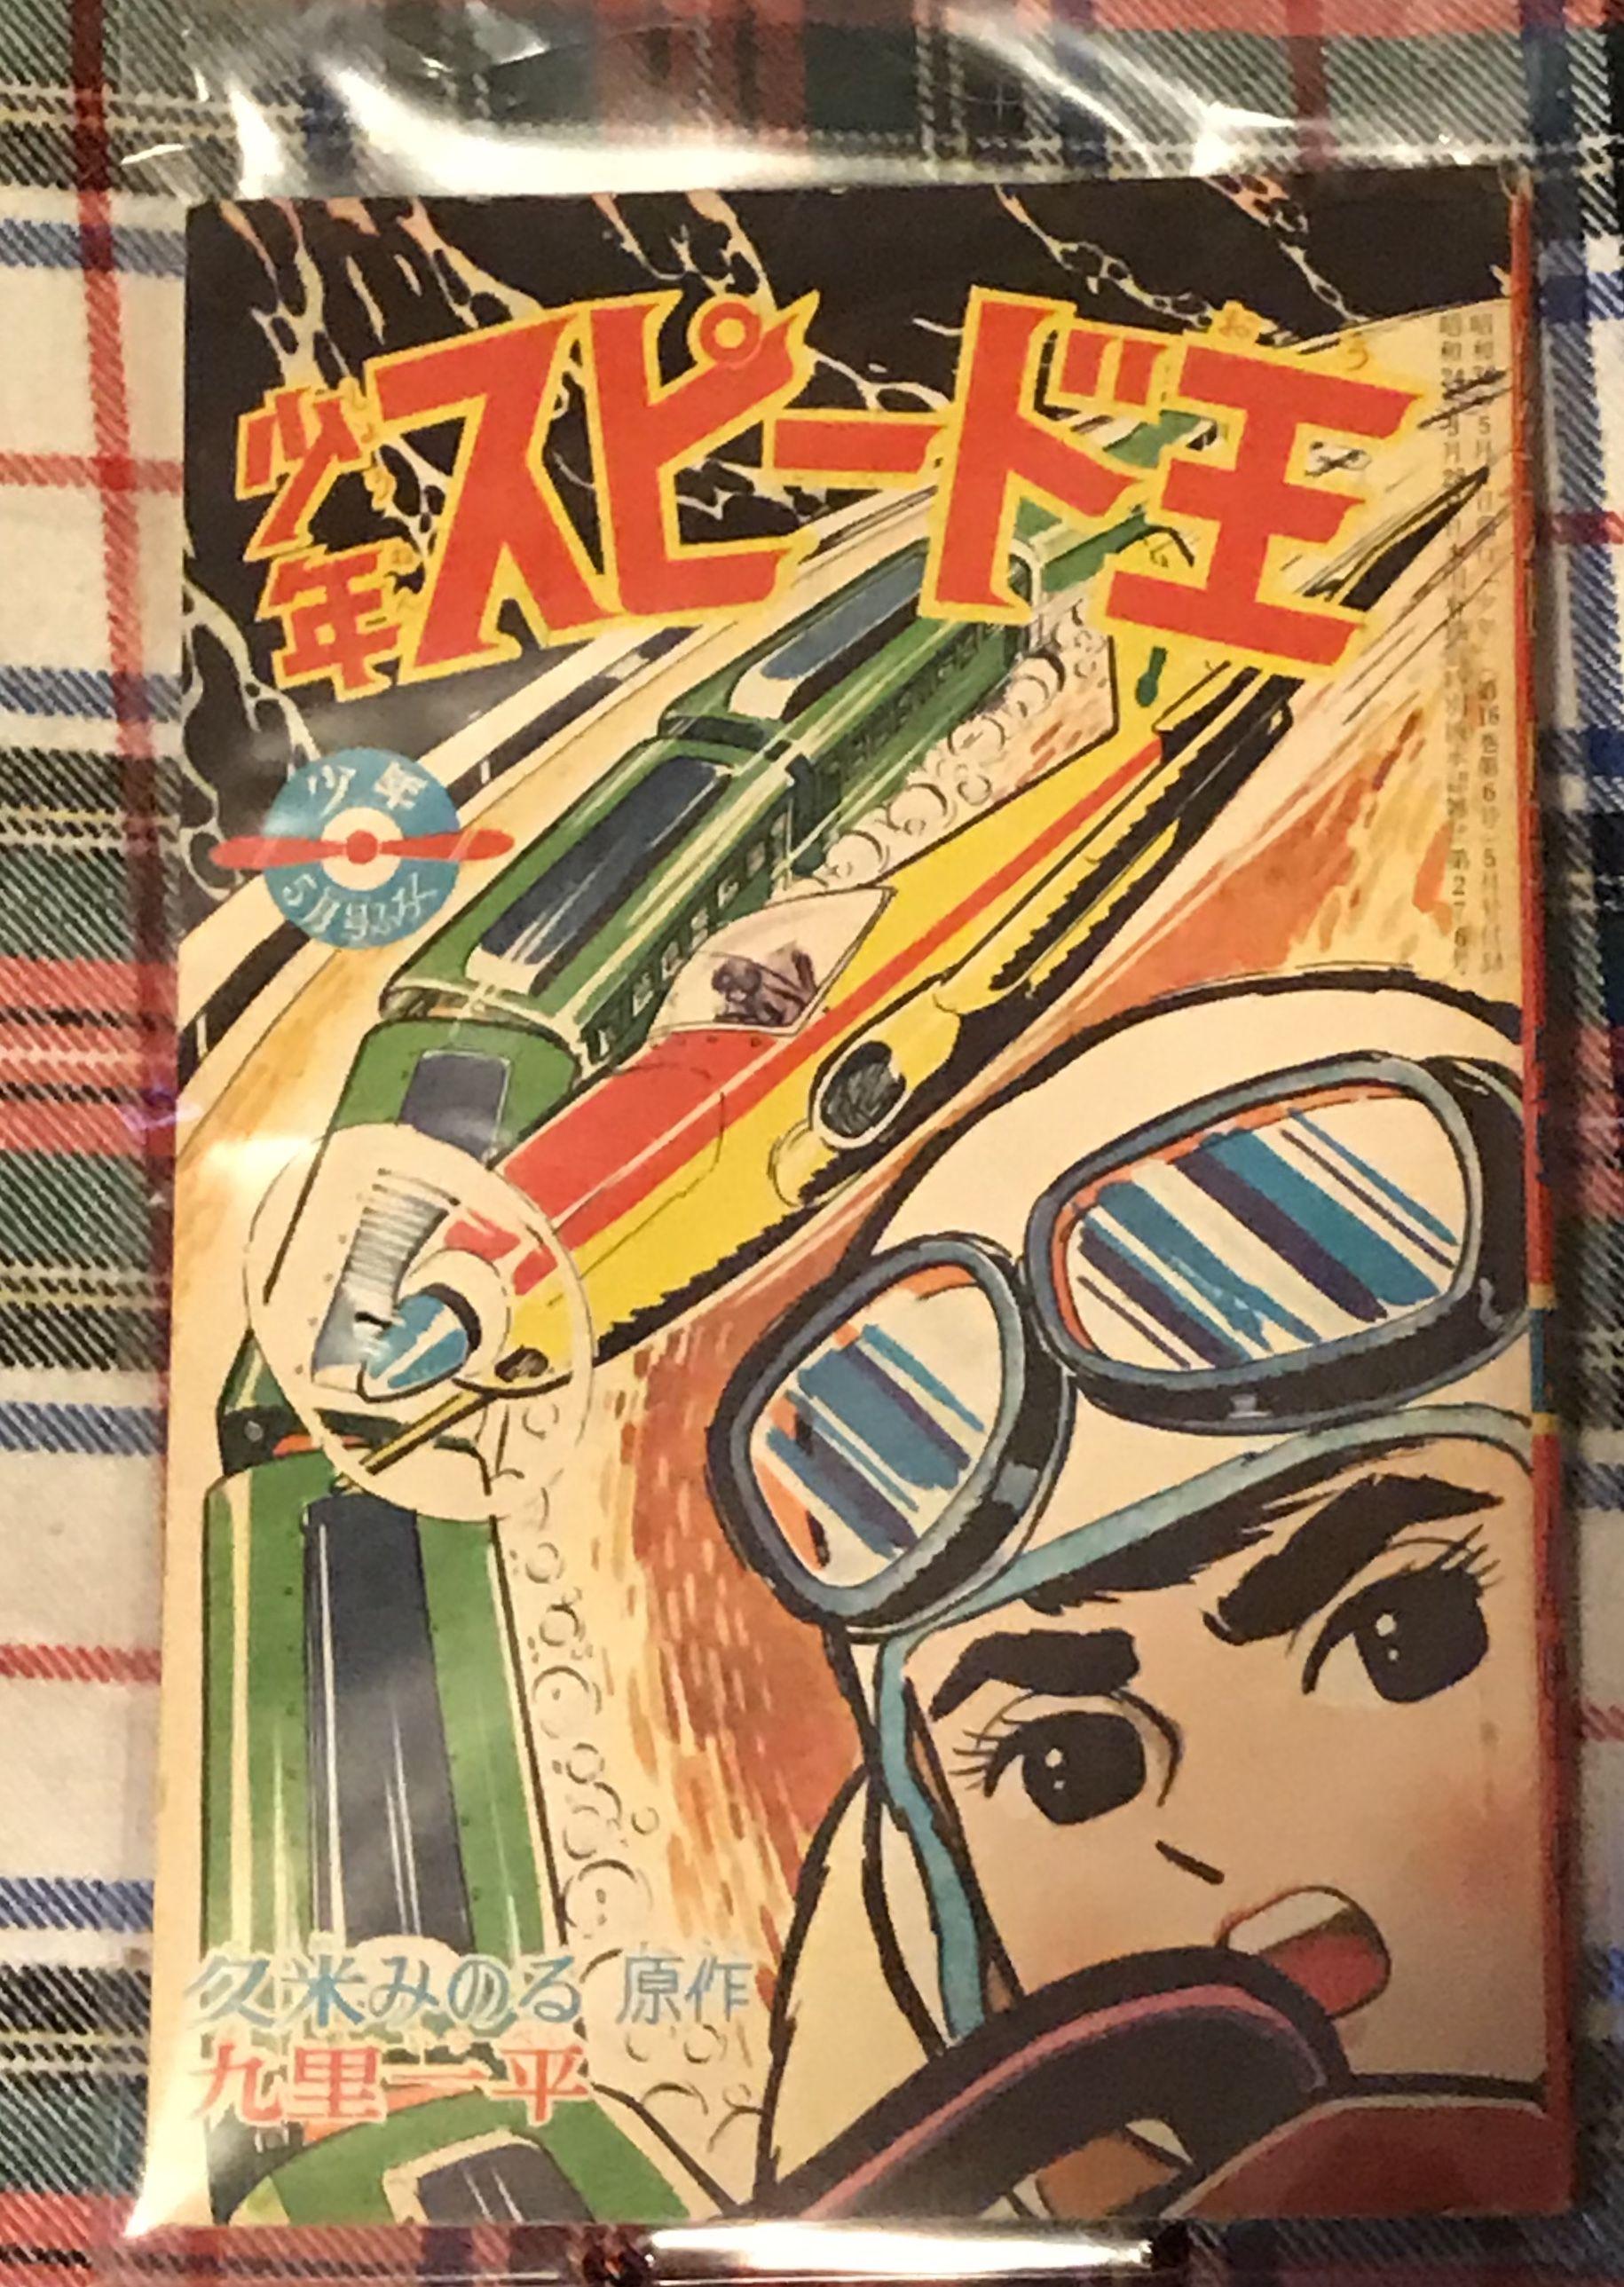 Early Speed Racer/Mach Go Tatsuo Yoshida and Ippei Kuri